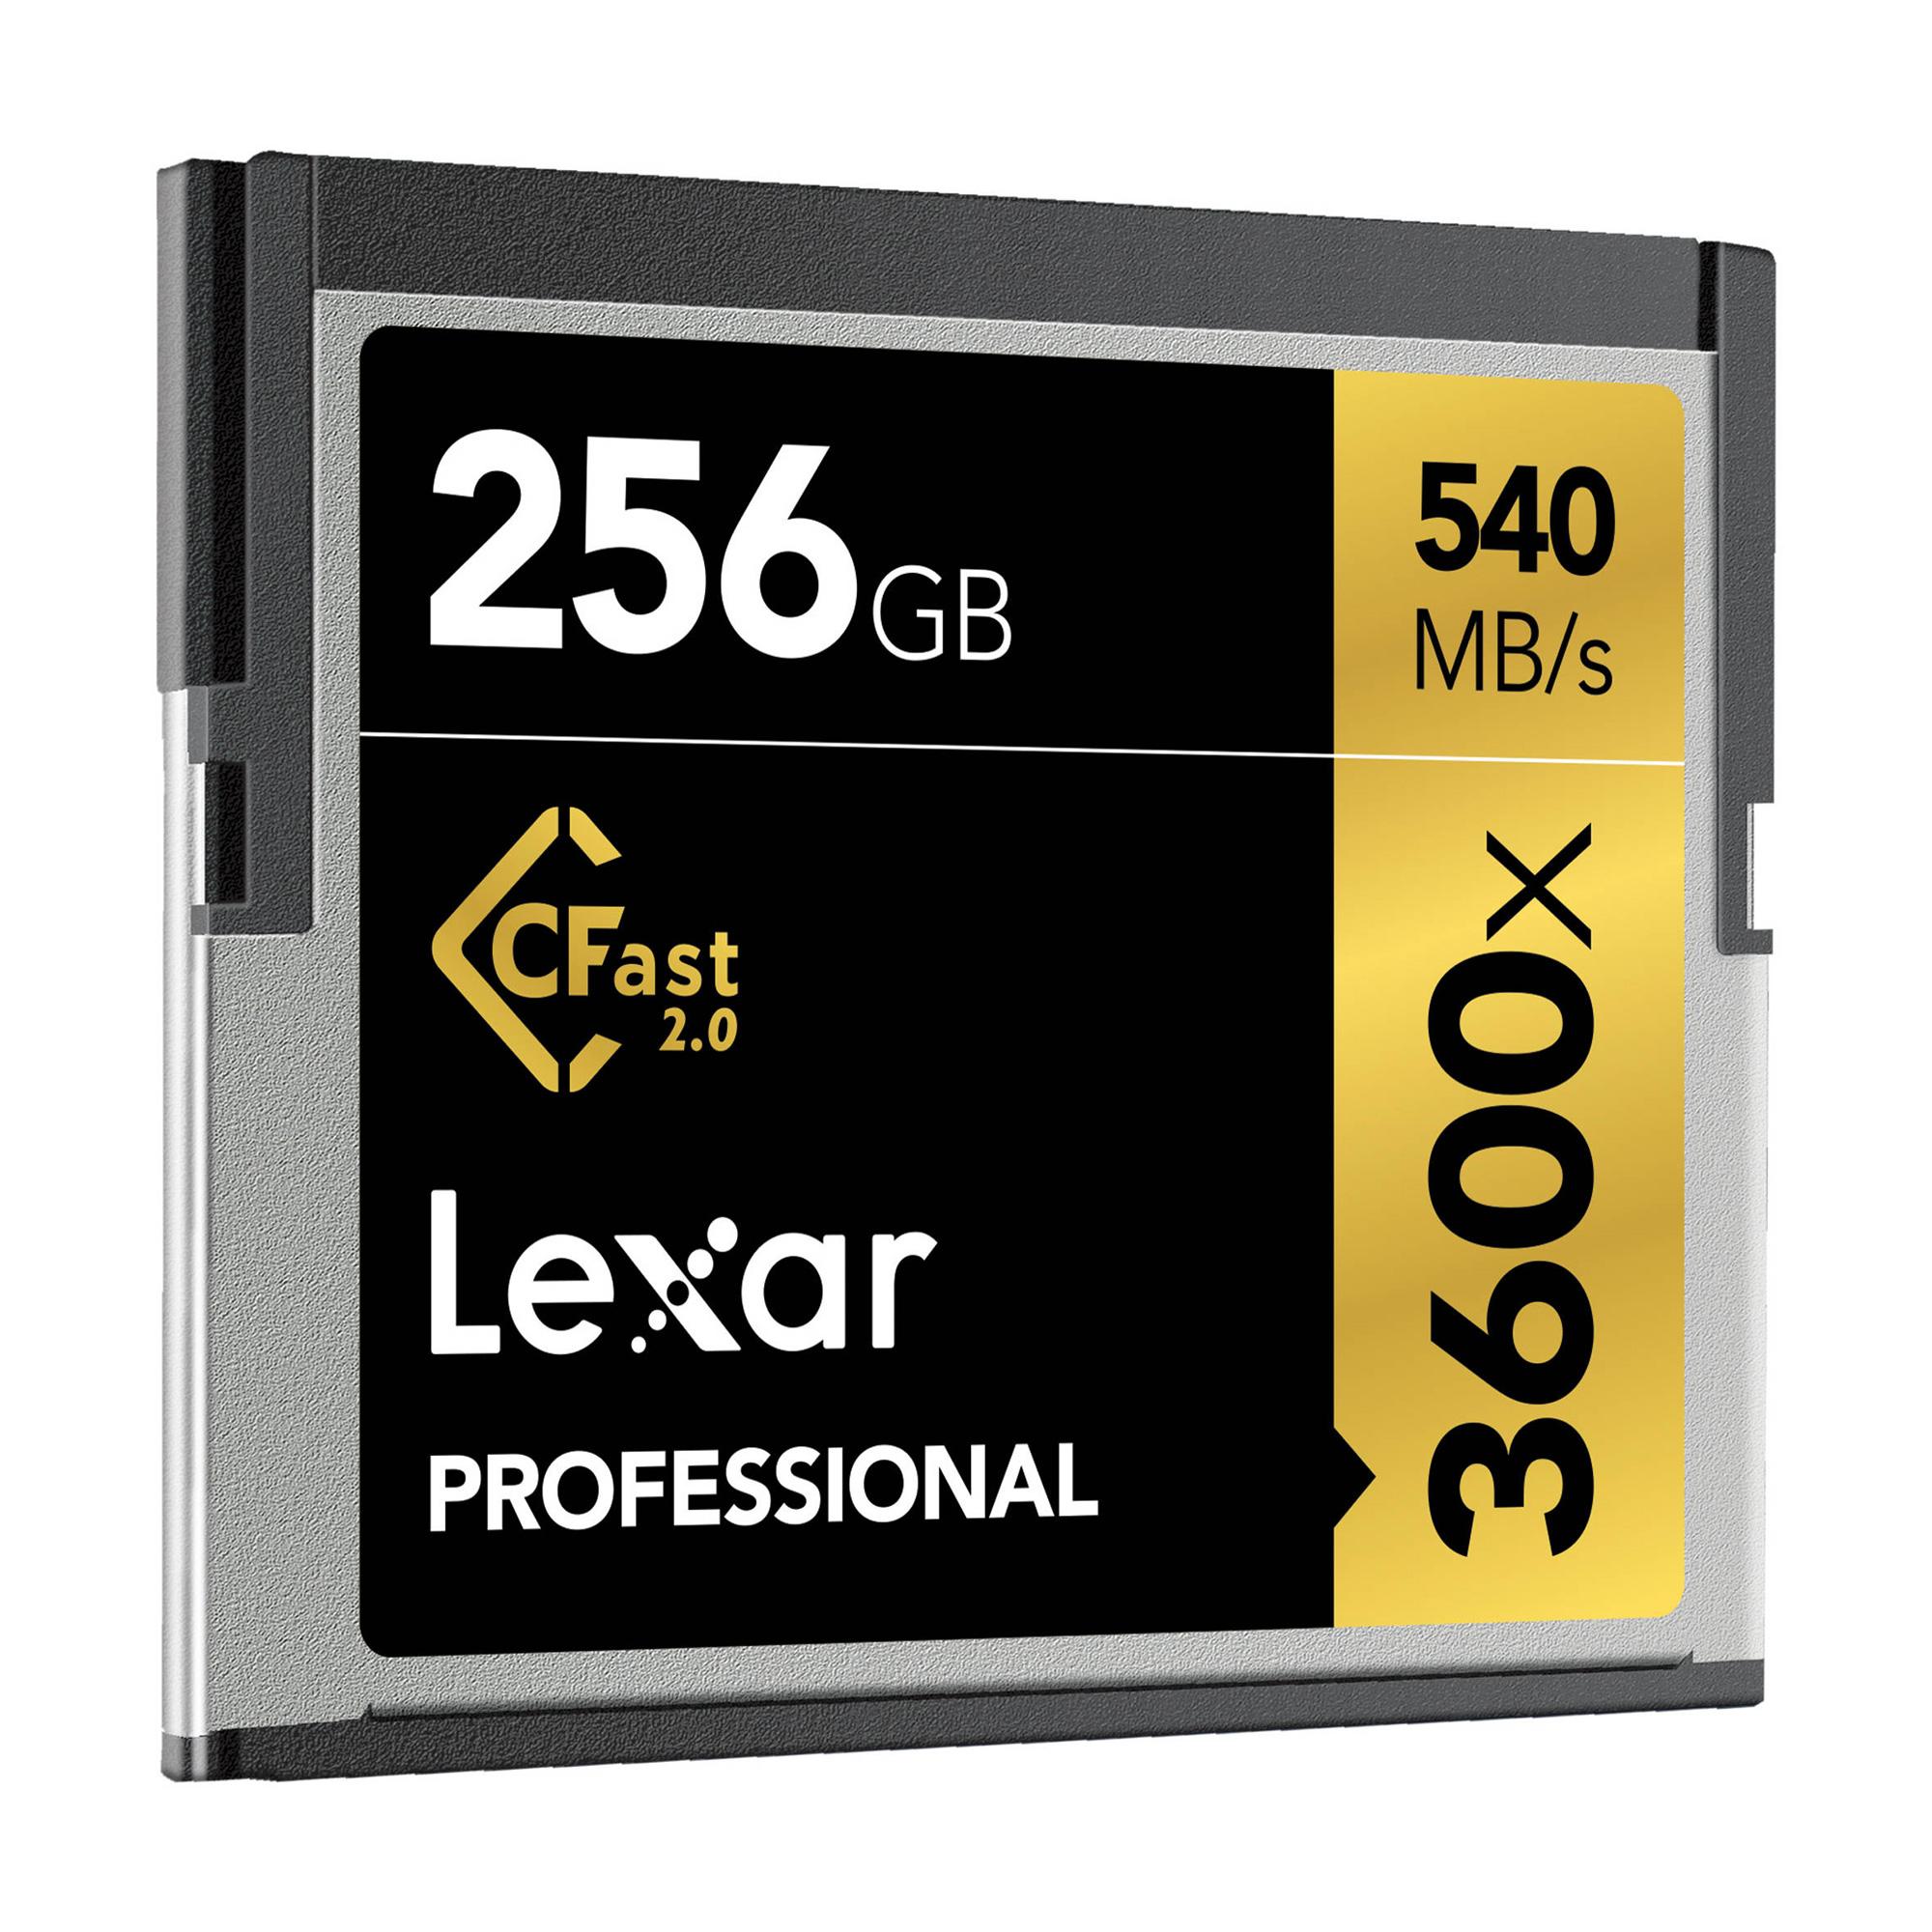 256GB Professional 3600x CFast 2.0 Memory Card